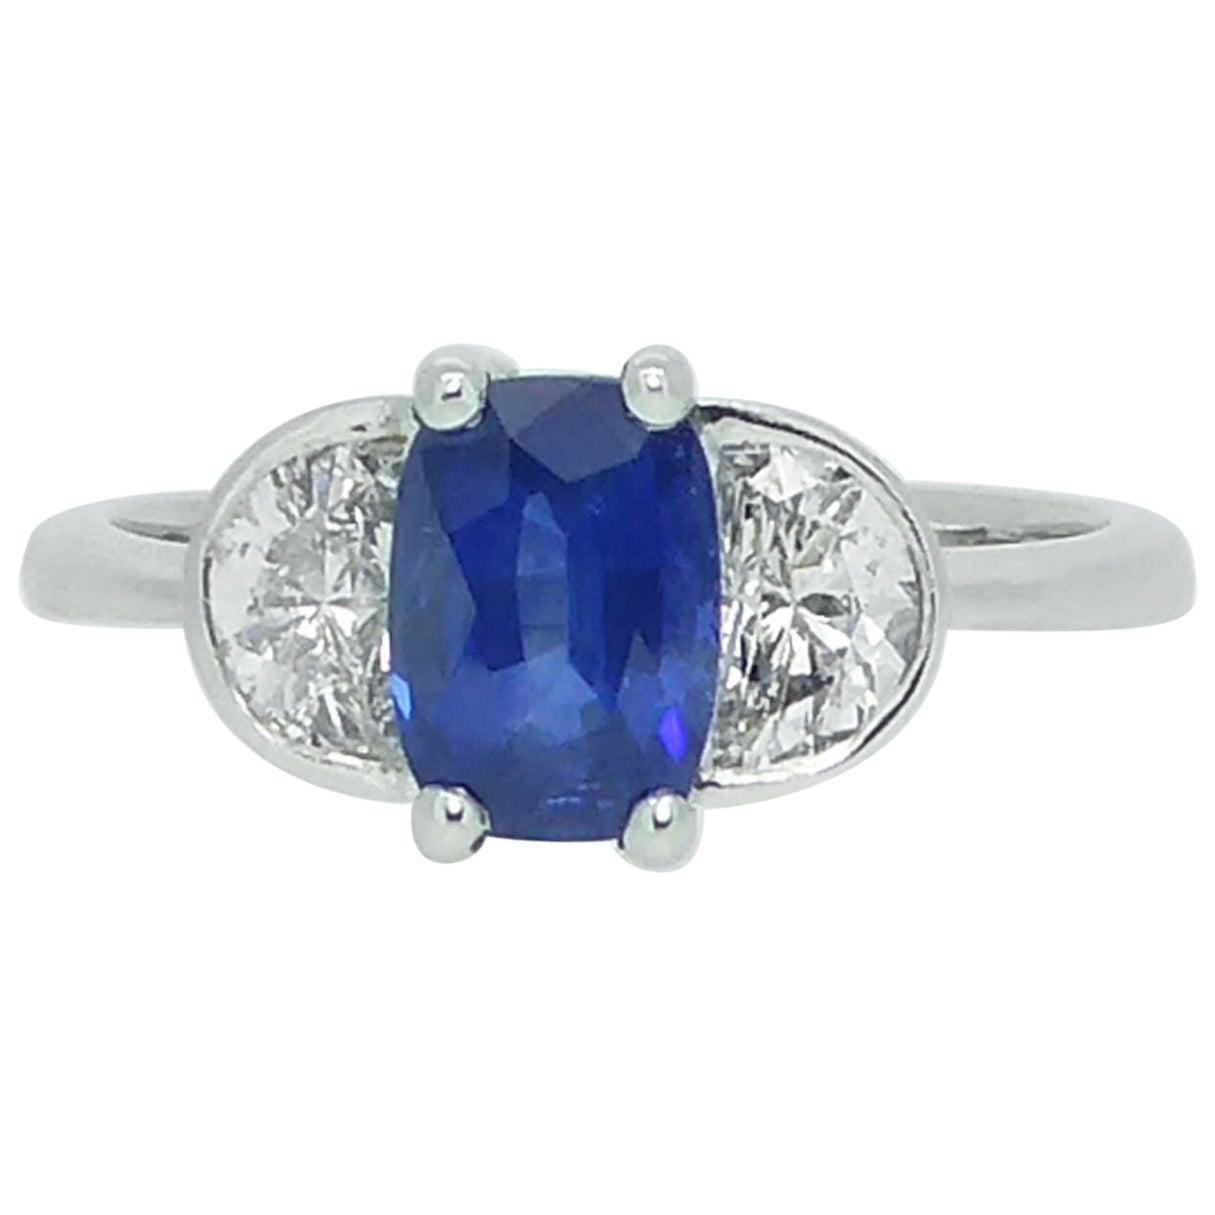 Modern 1.21 Carat Sapphire Ring, Half-Moon Diamonds 0.61 Carat, New and Unworn